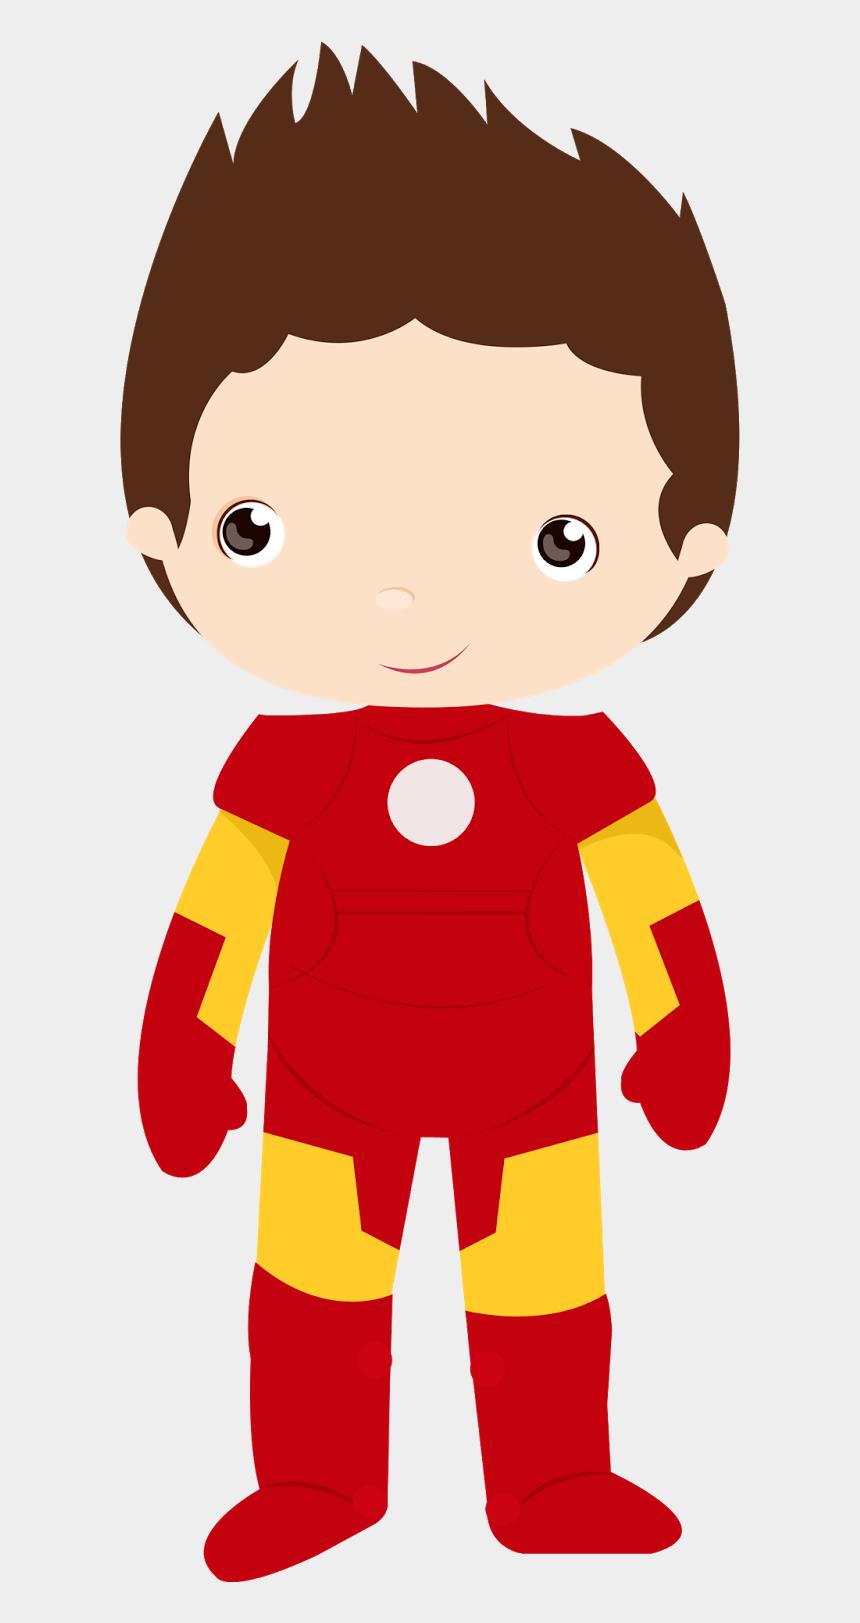 supergirl clipart, Cartoons - Avengers Clipart Avengers Pretty Clipart 003 - Iron Man Cute Png